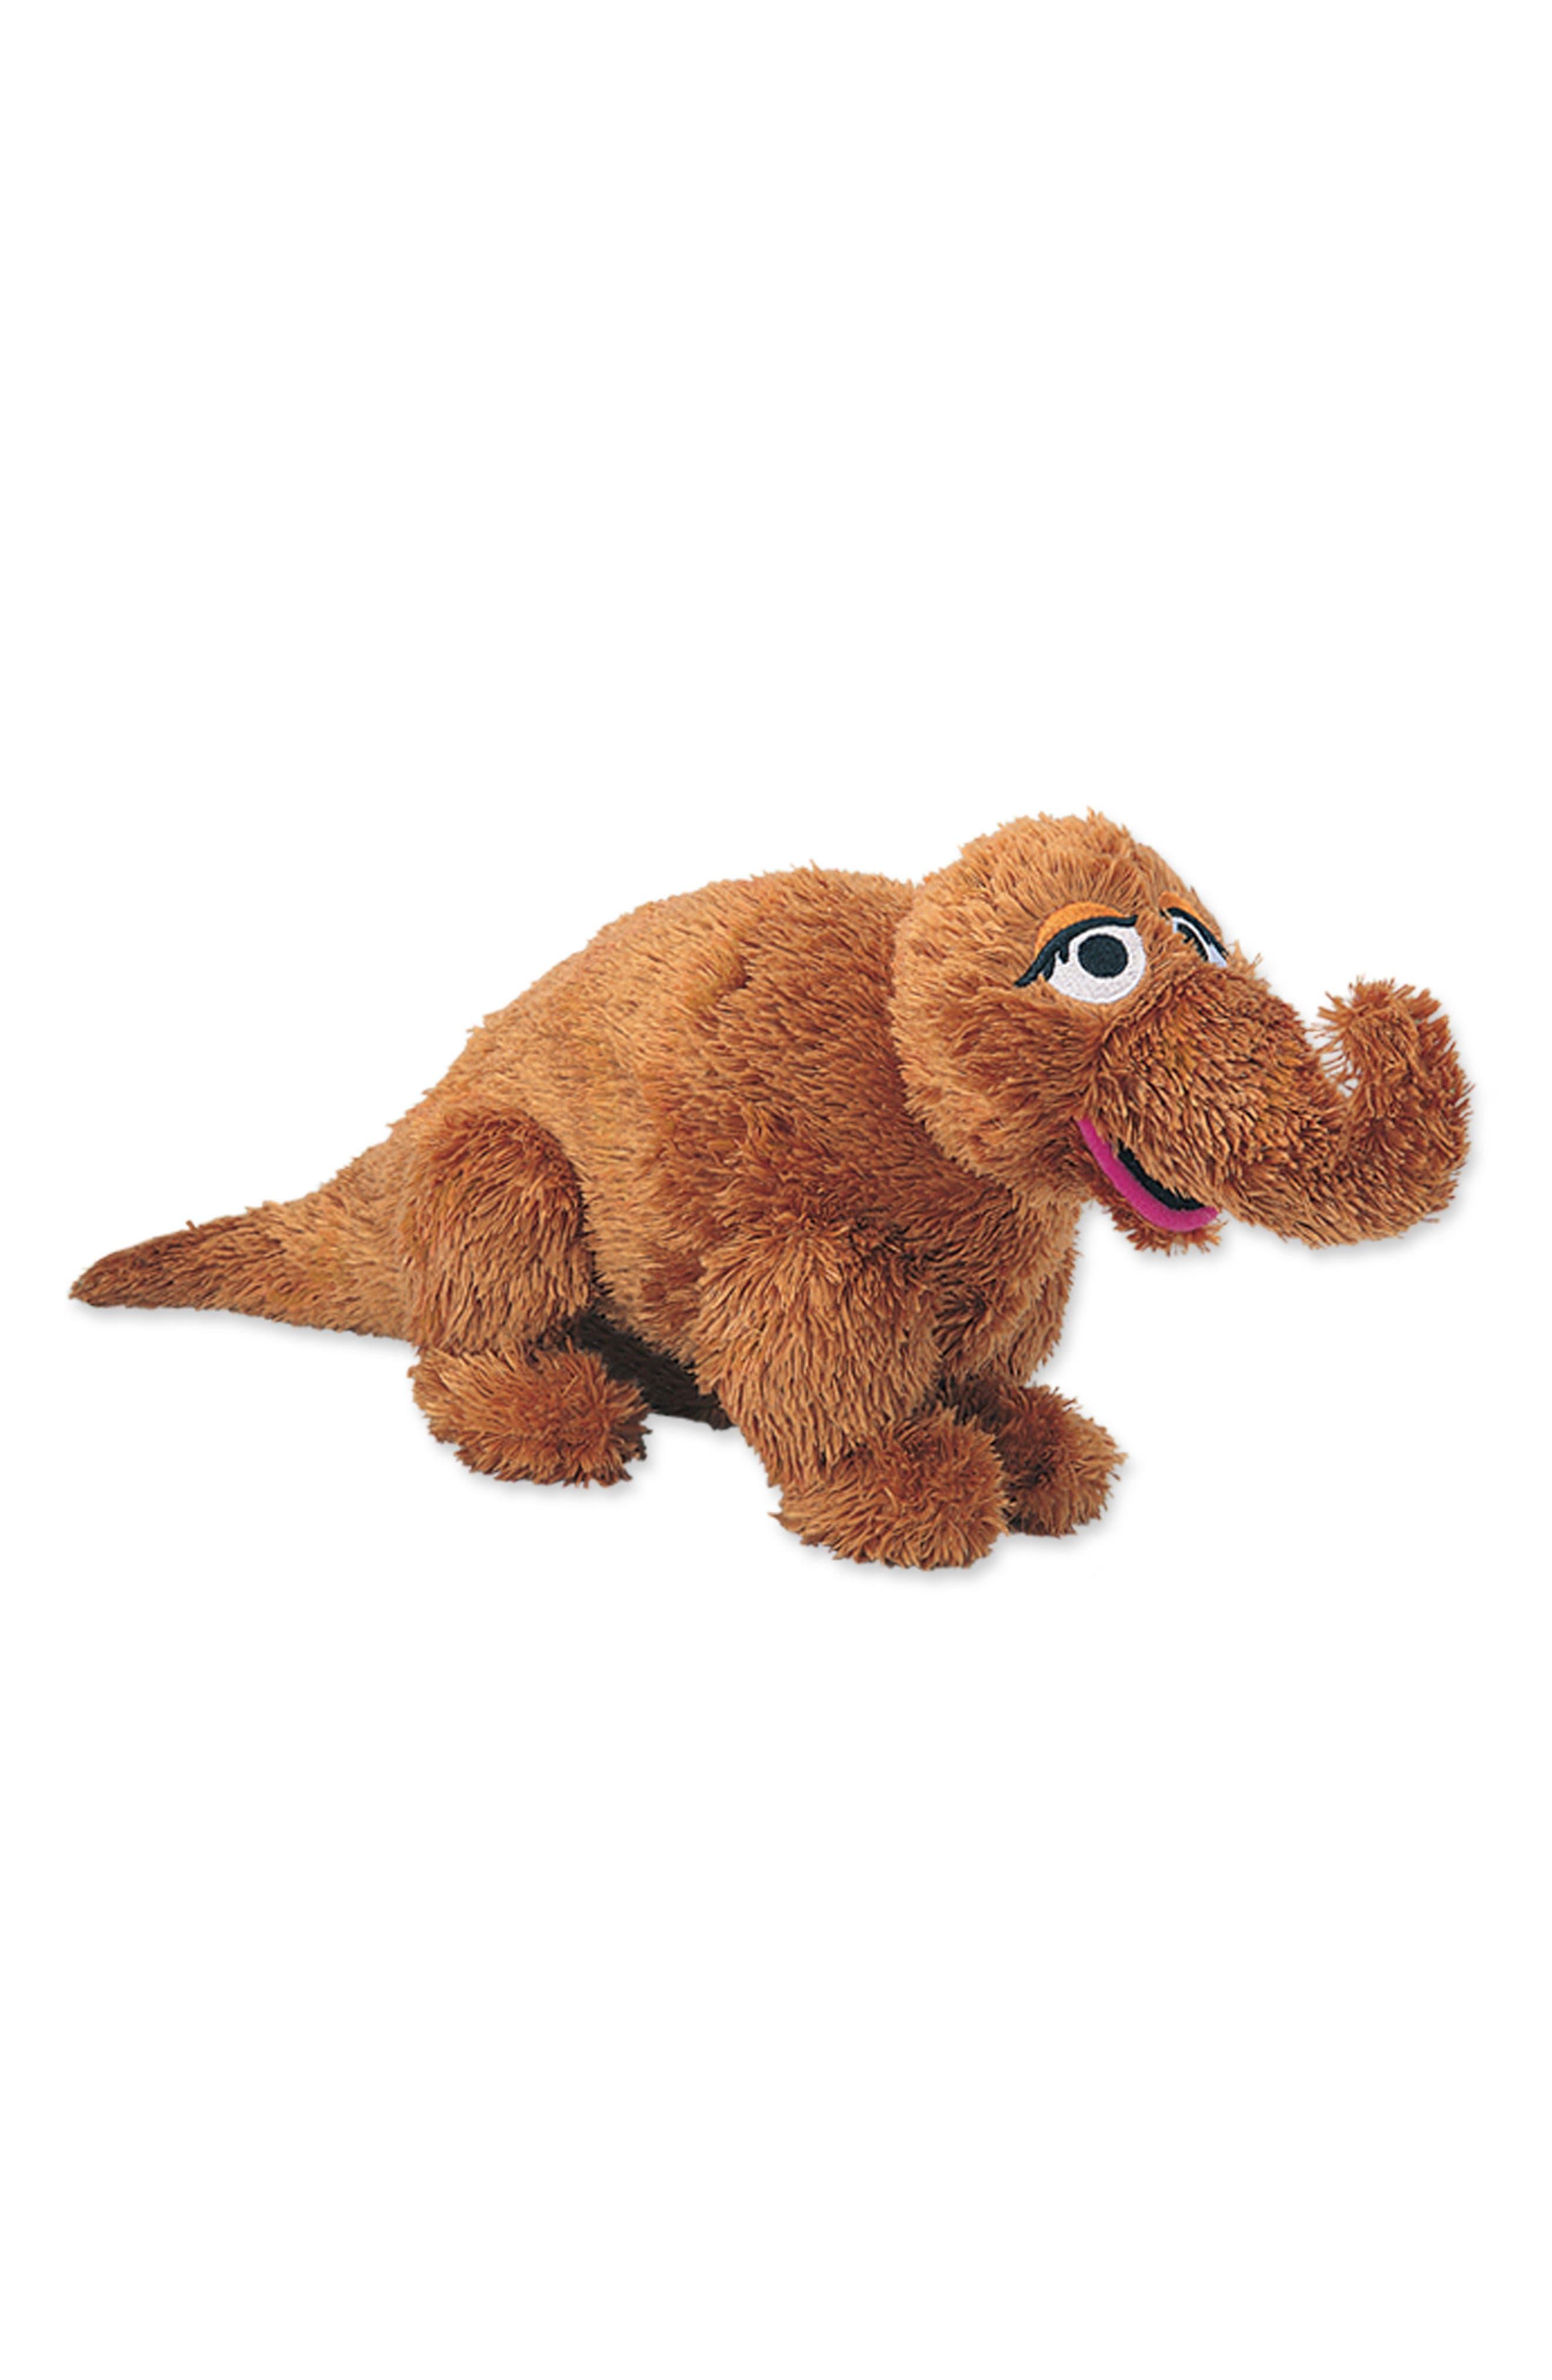 Main Image - Gund 'Snuffleupagus' Stuffed Toy